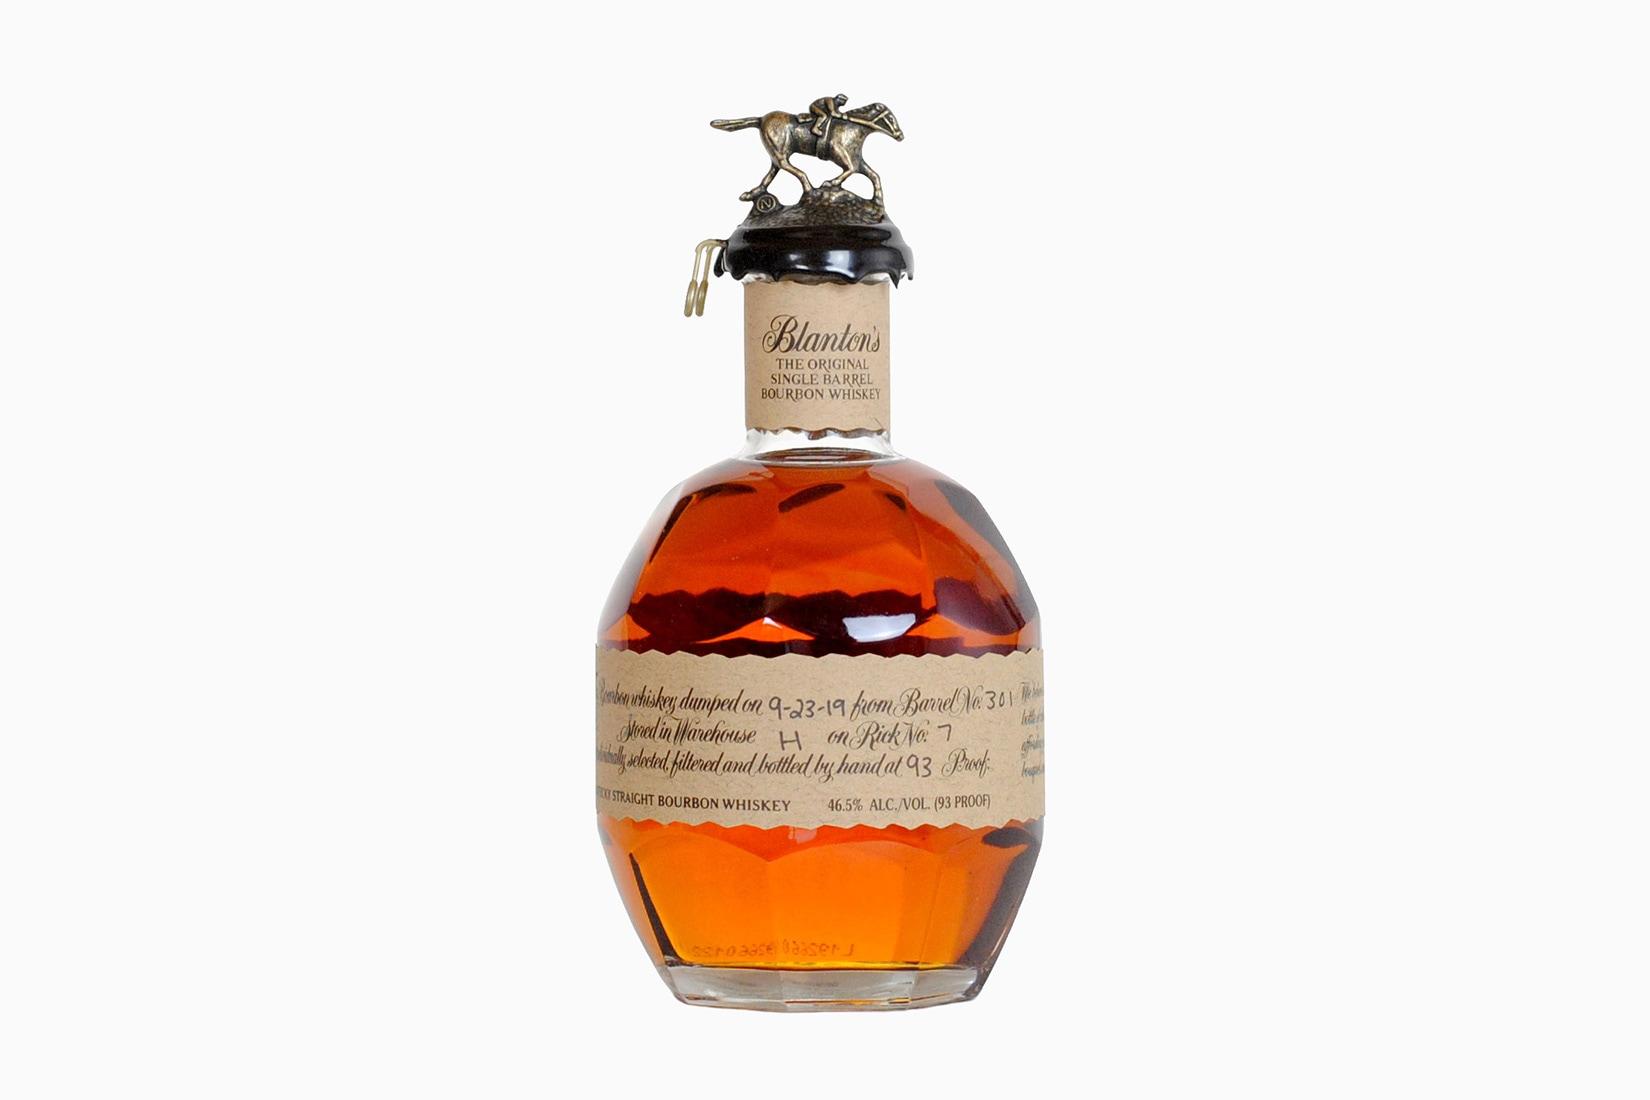 Tamaño de la botella de whisky bourbon de blanton's - Luxe Digital